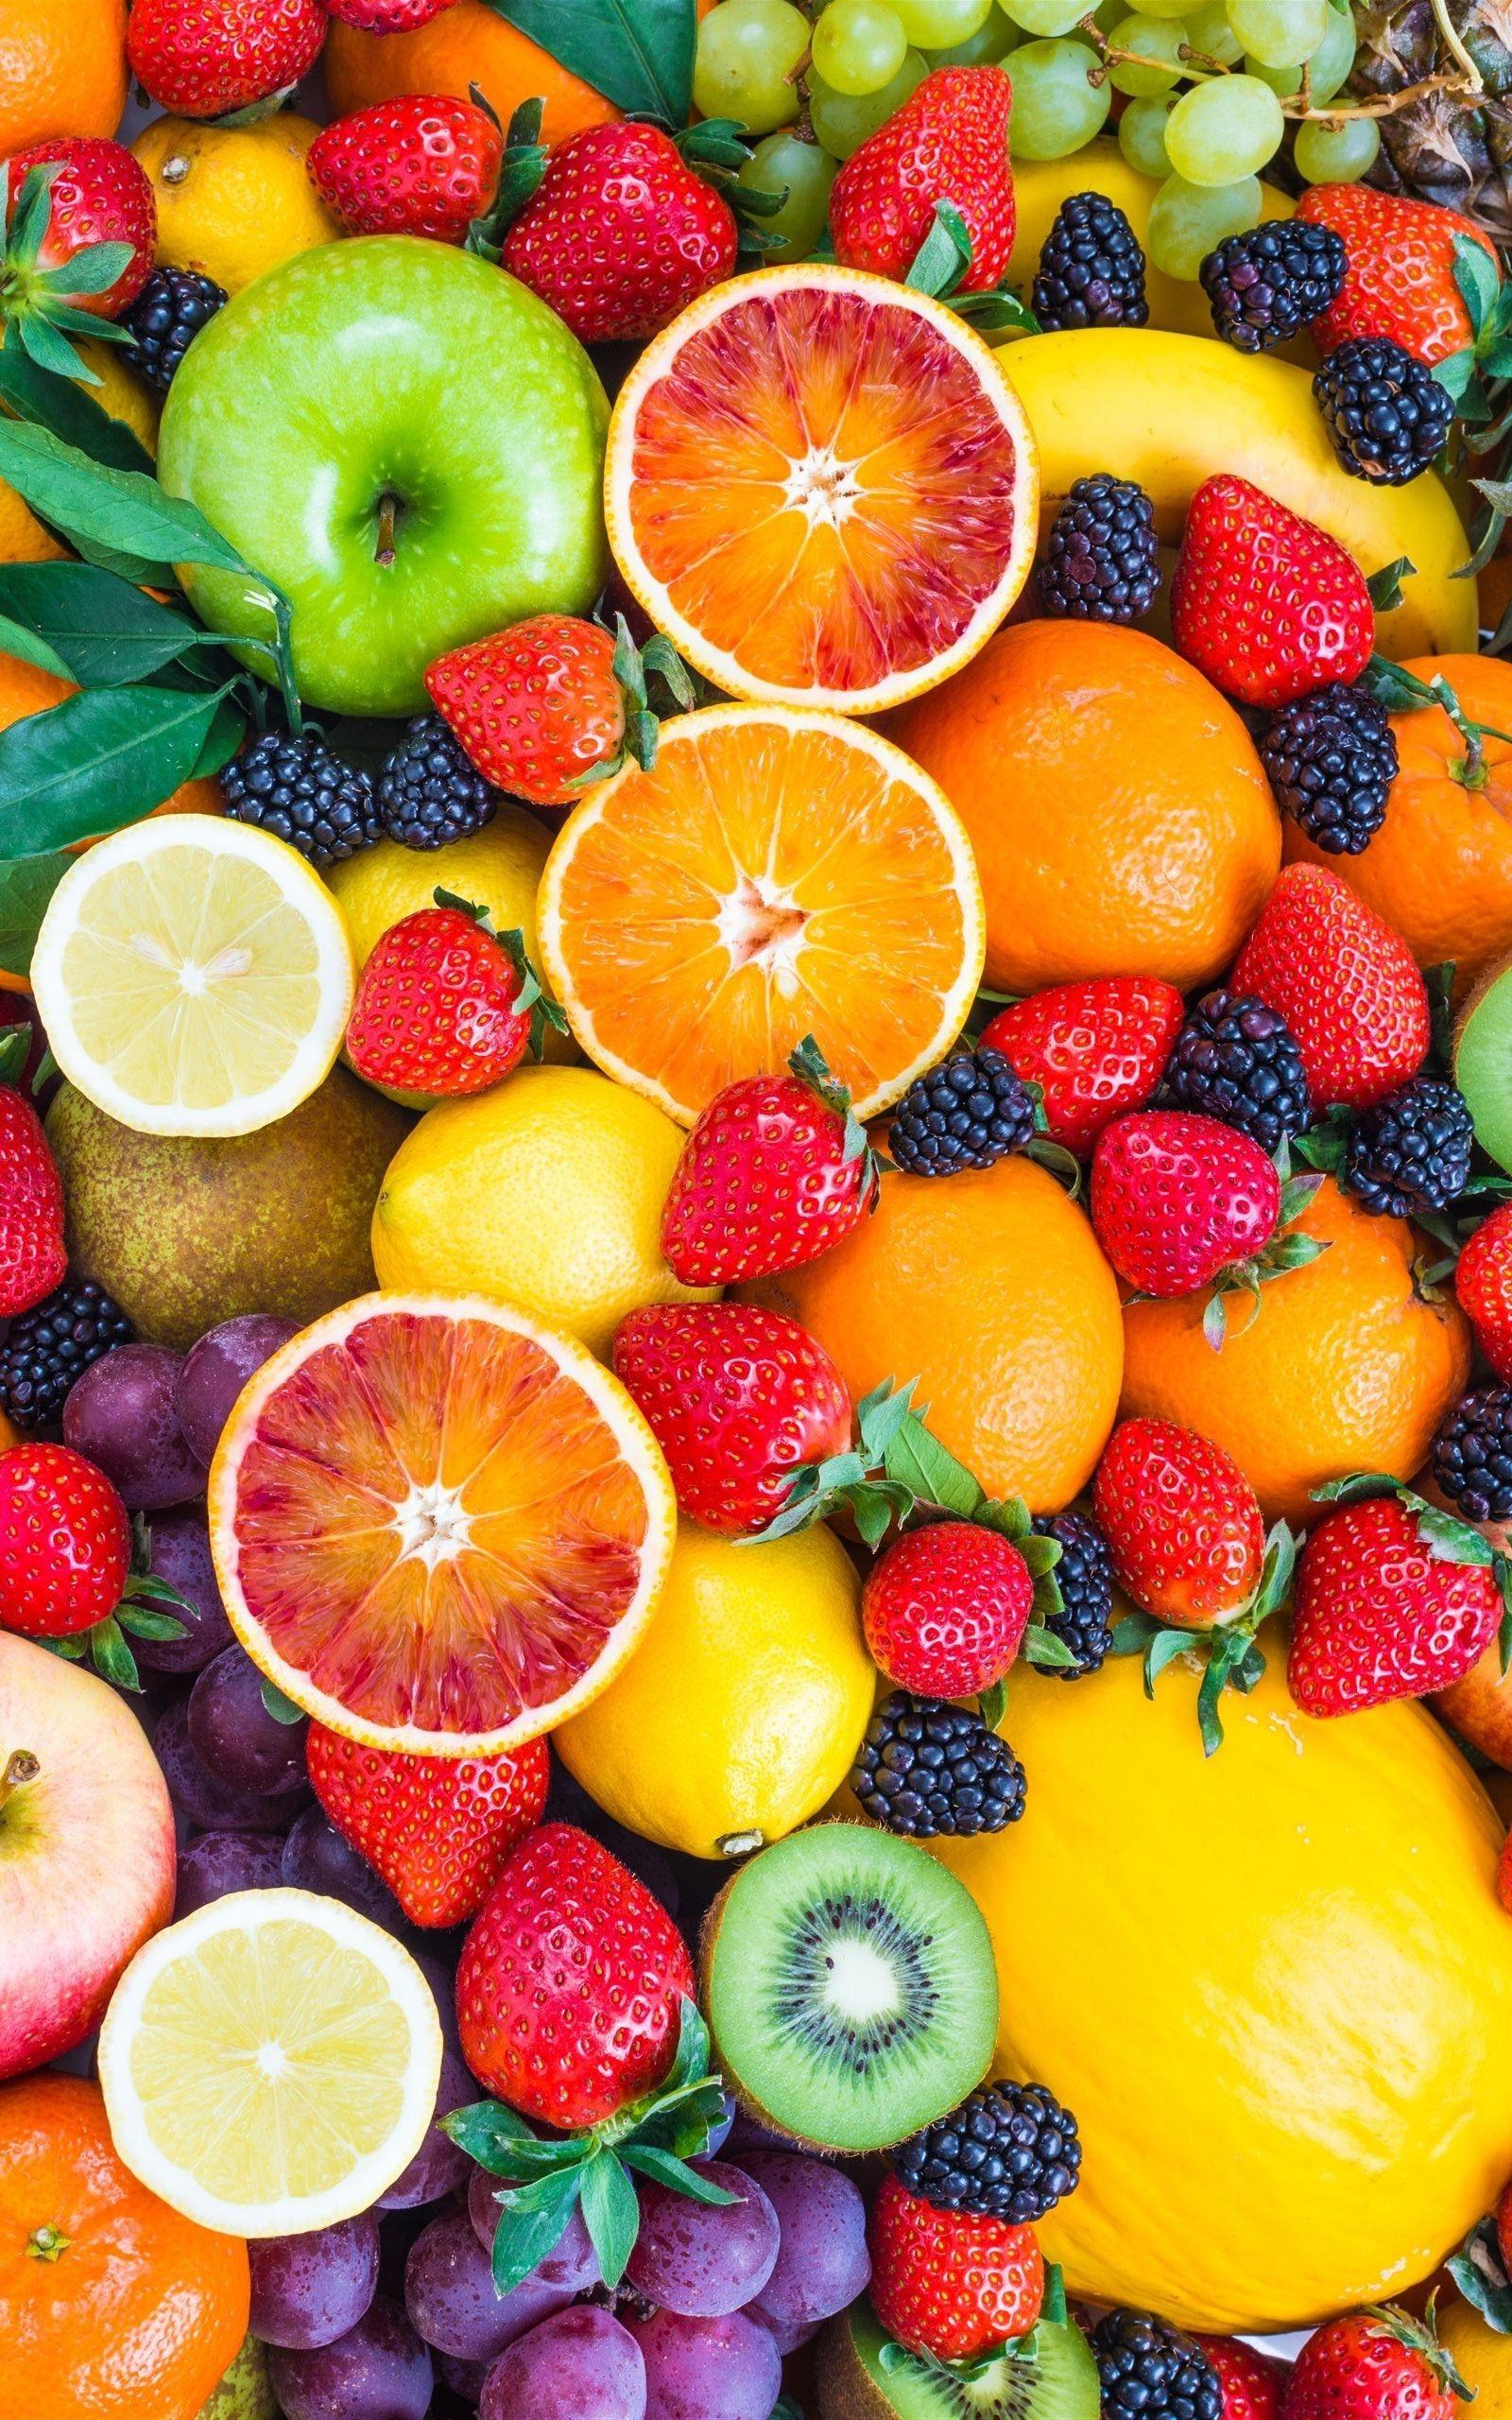 Best Fresh Fruit Wallpaper Iphone Best Iphone Wallpaper Food Wallpaper Fruit Wallpaper Fruit Photography